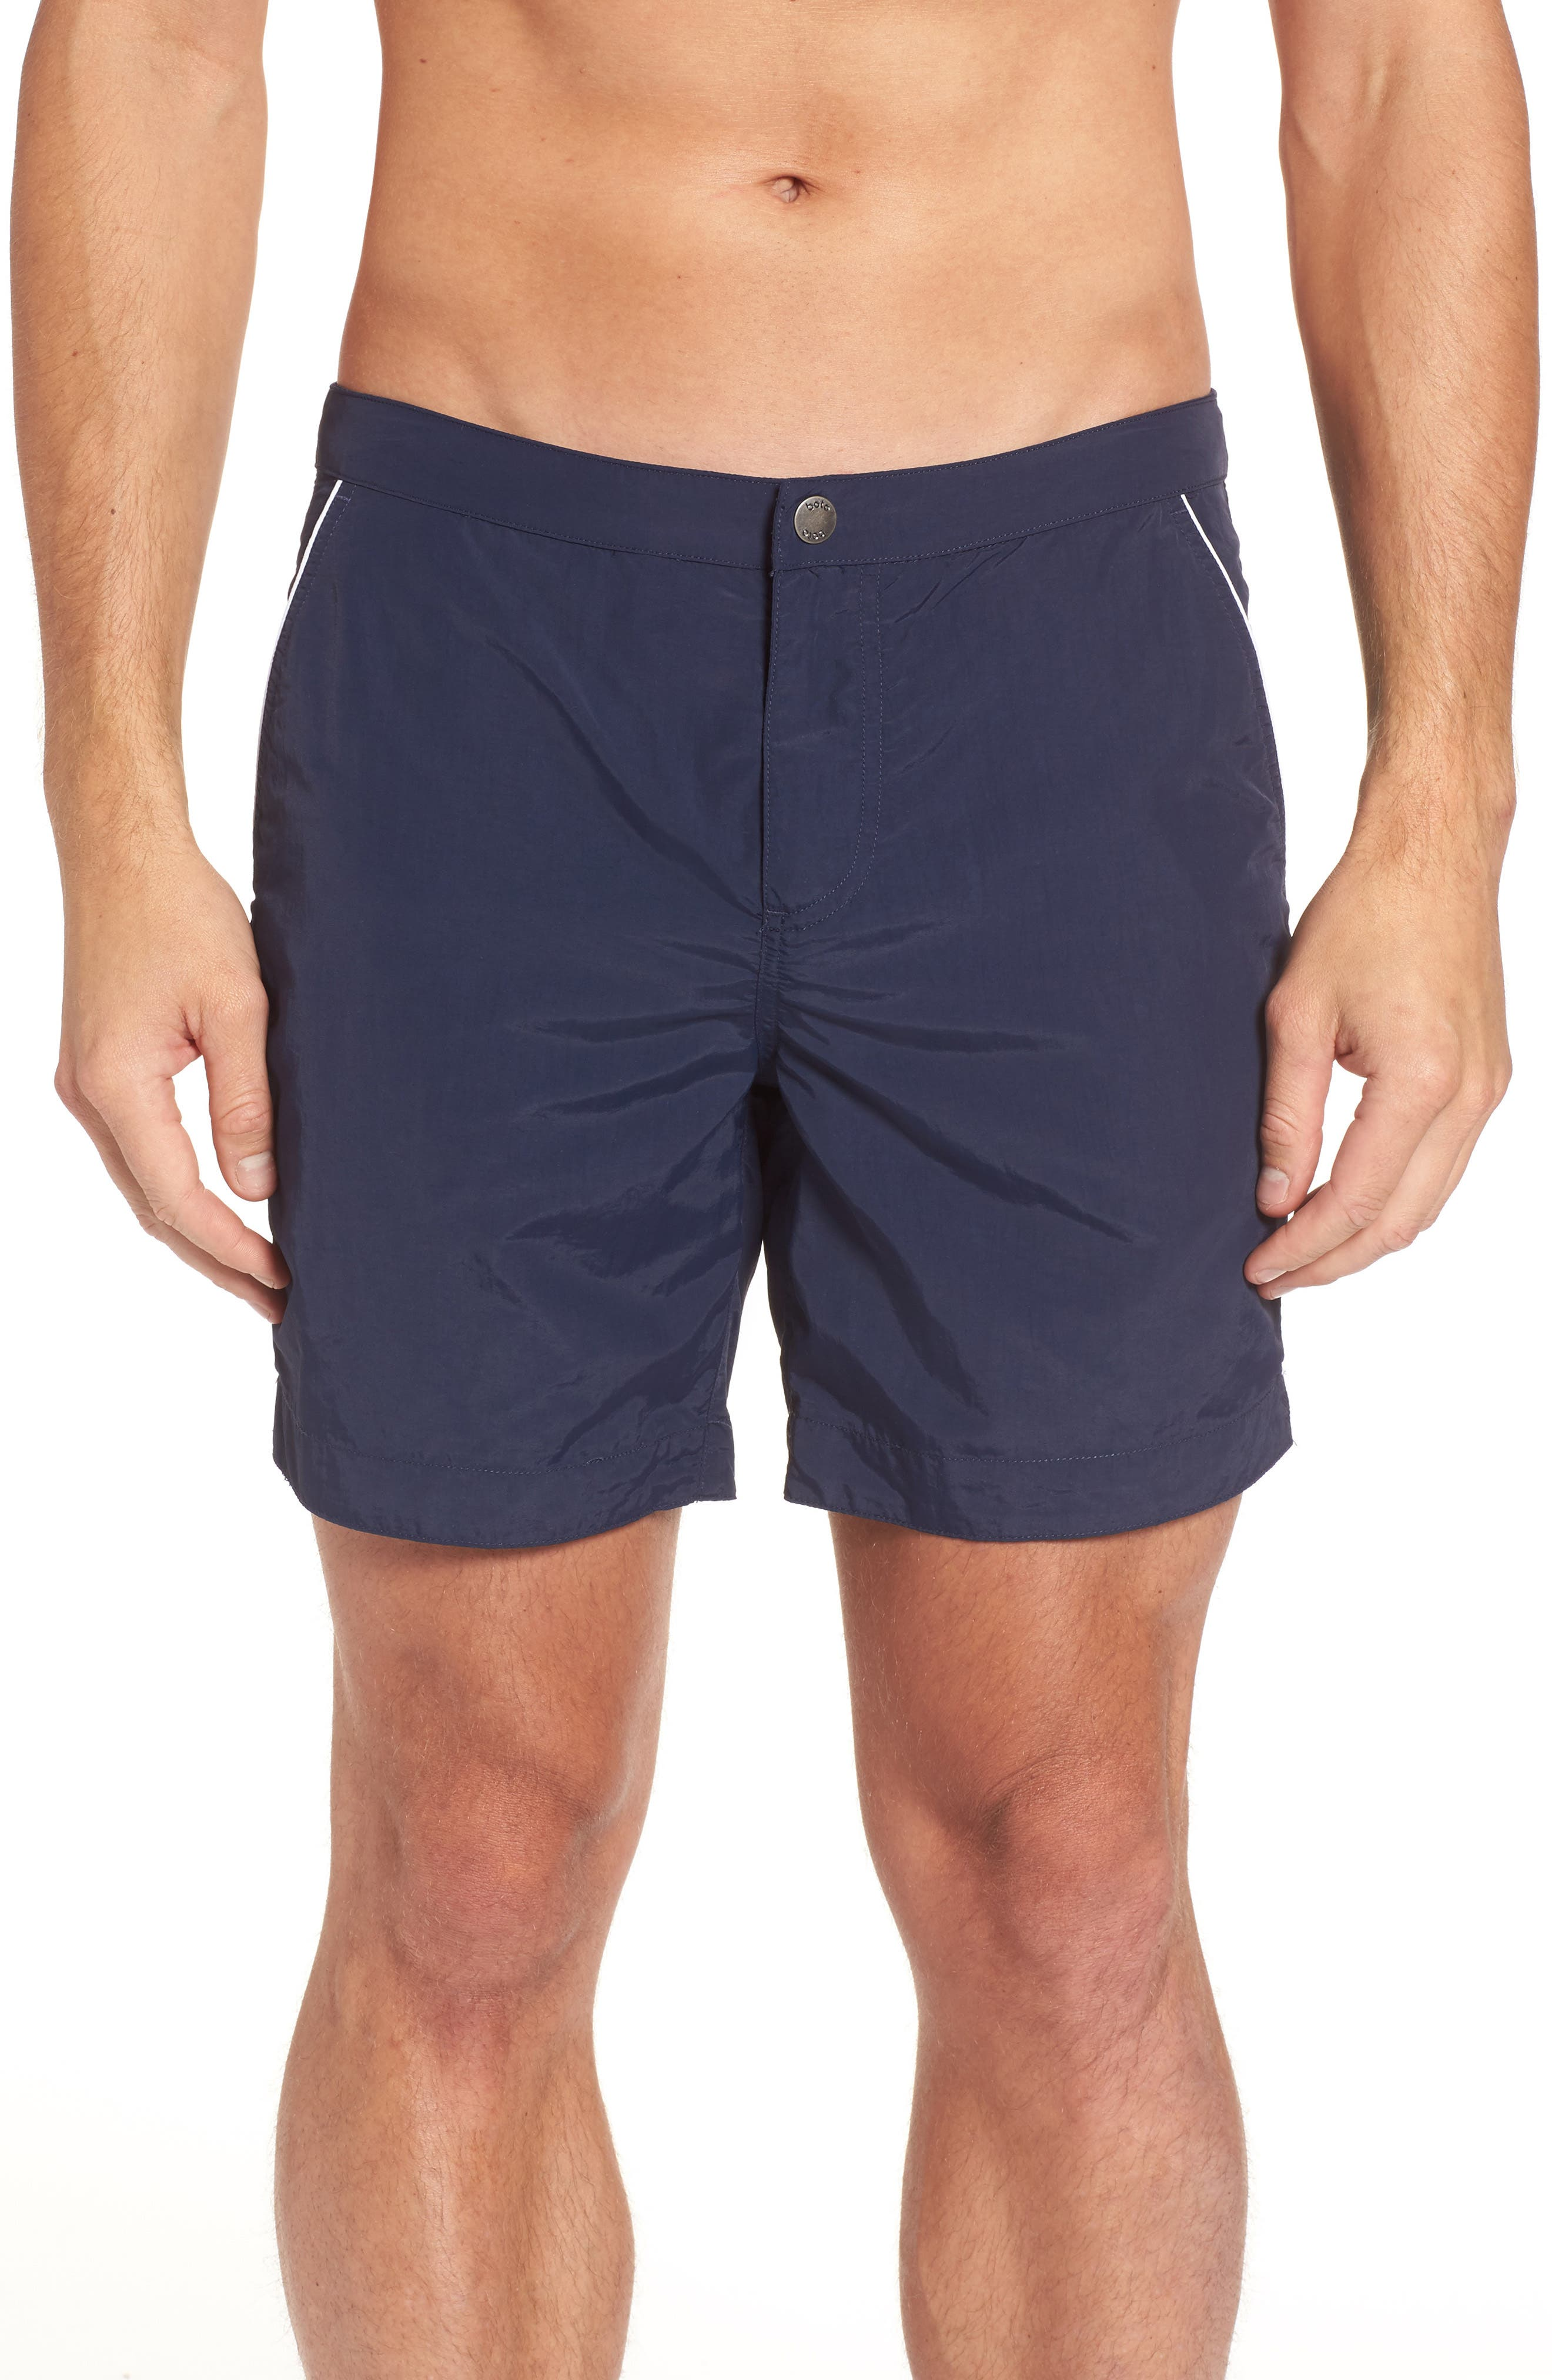 Vintage Men's Swimsuits – 1930s to 1970s History Mens Boto Rio Regular Fit Swim Trunks Size 31 - Blue $79.00 AT vintagedancer.com